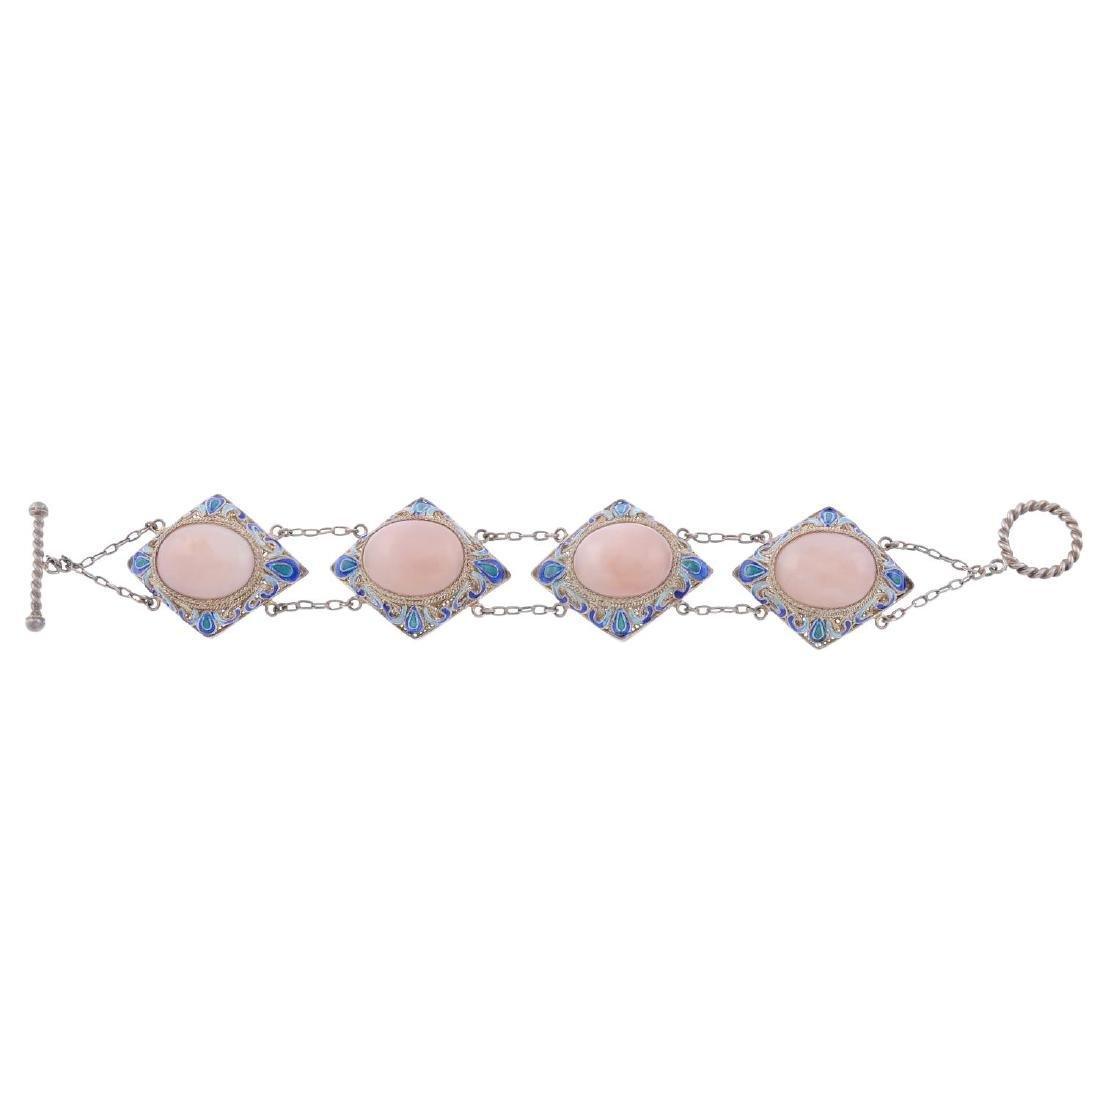 A gem and enamel silver bracelet. Designed as a series